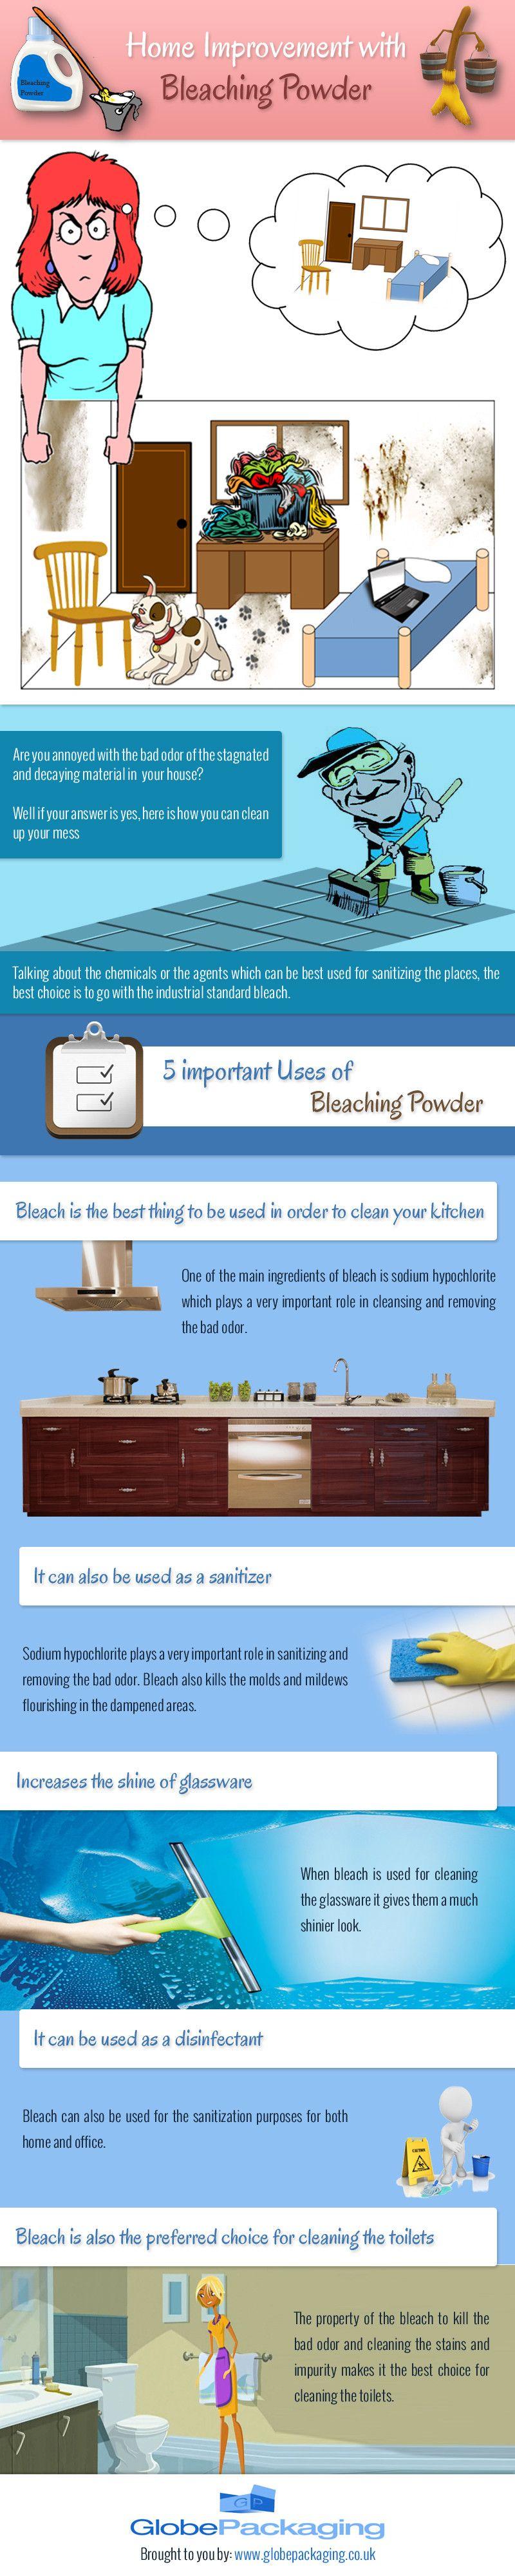 Bleaching powder for cleaning bathroom - Bleaching Powder For Cleaning Bathroom 46